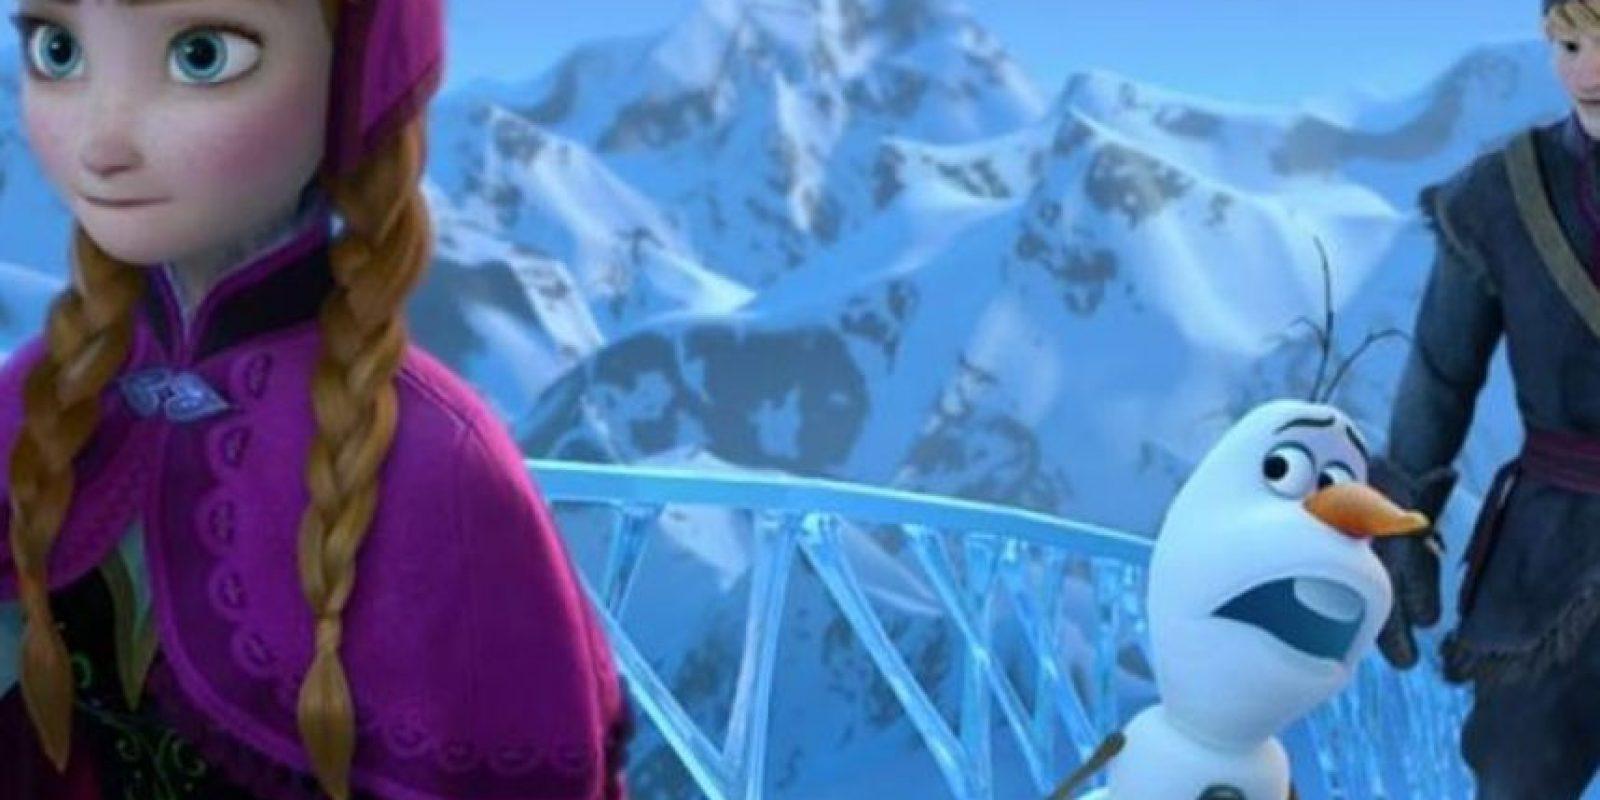 Anna desea saber por qué sus padres encerraron a Elsa. Foto:Disney